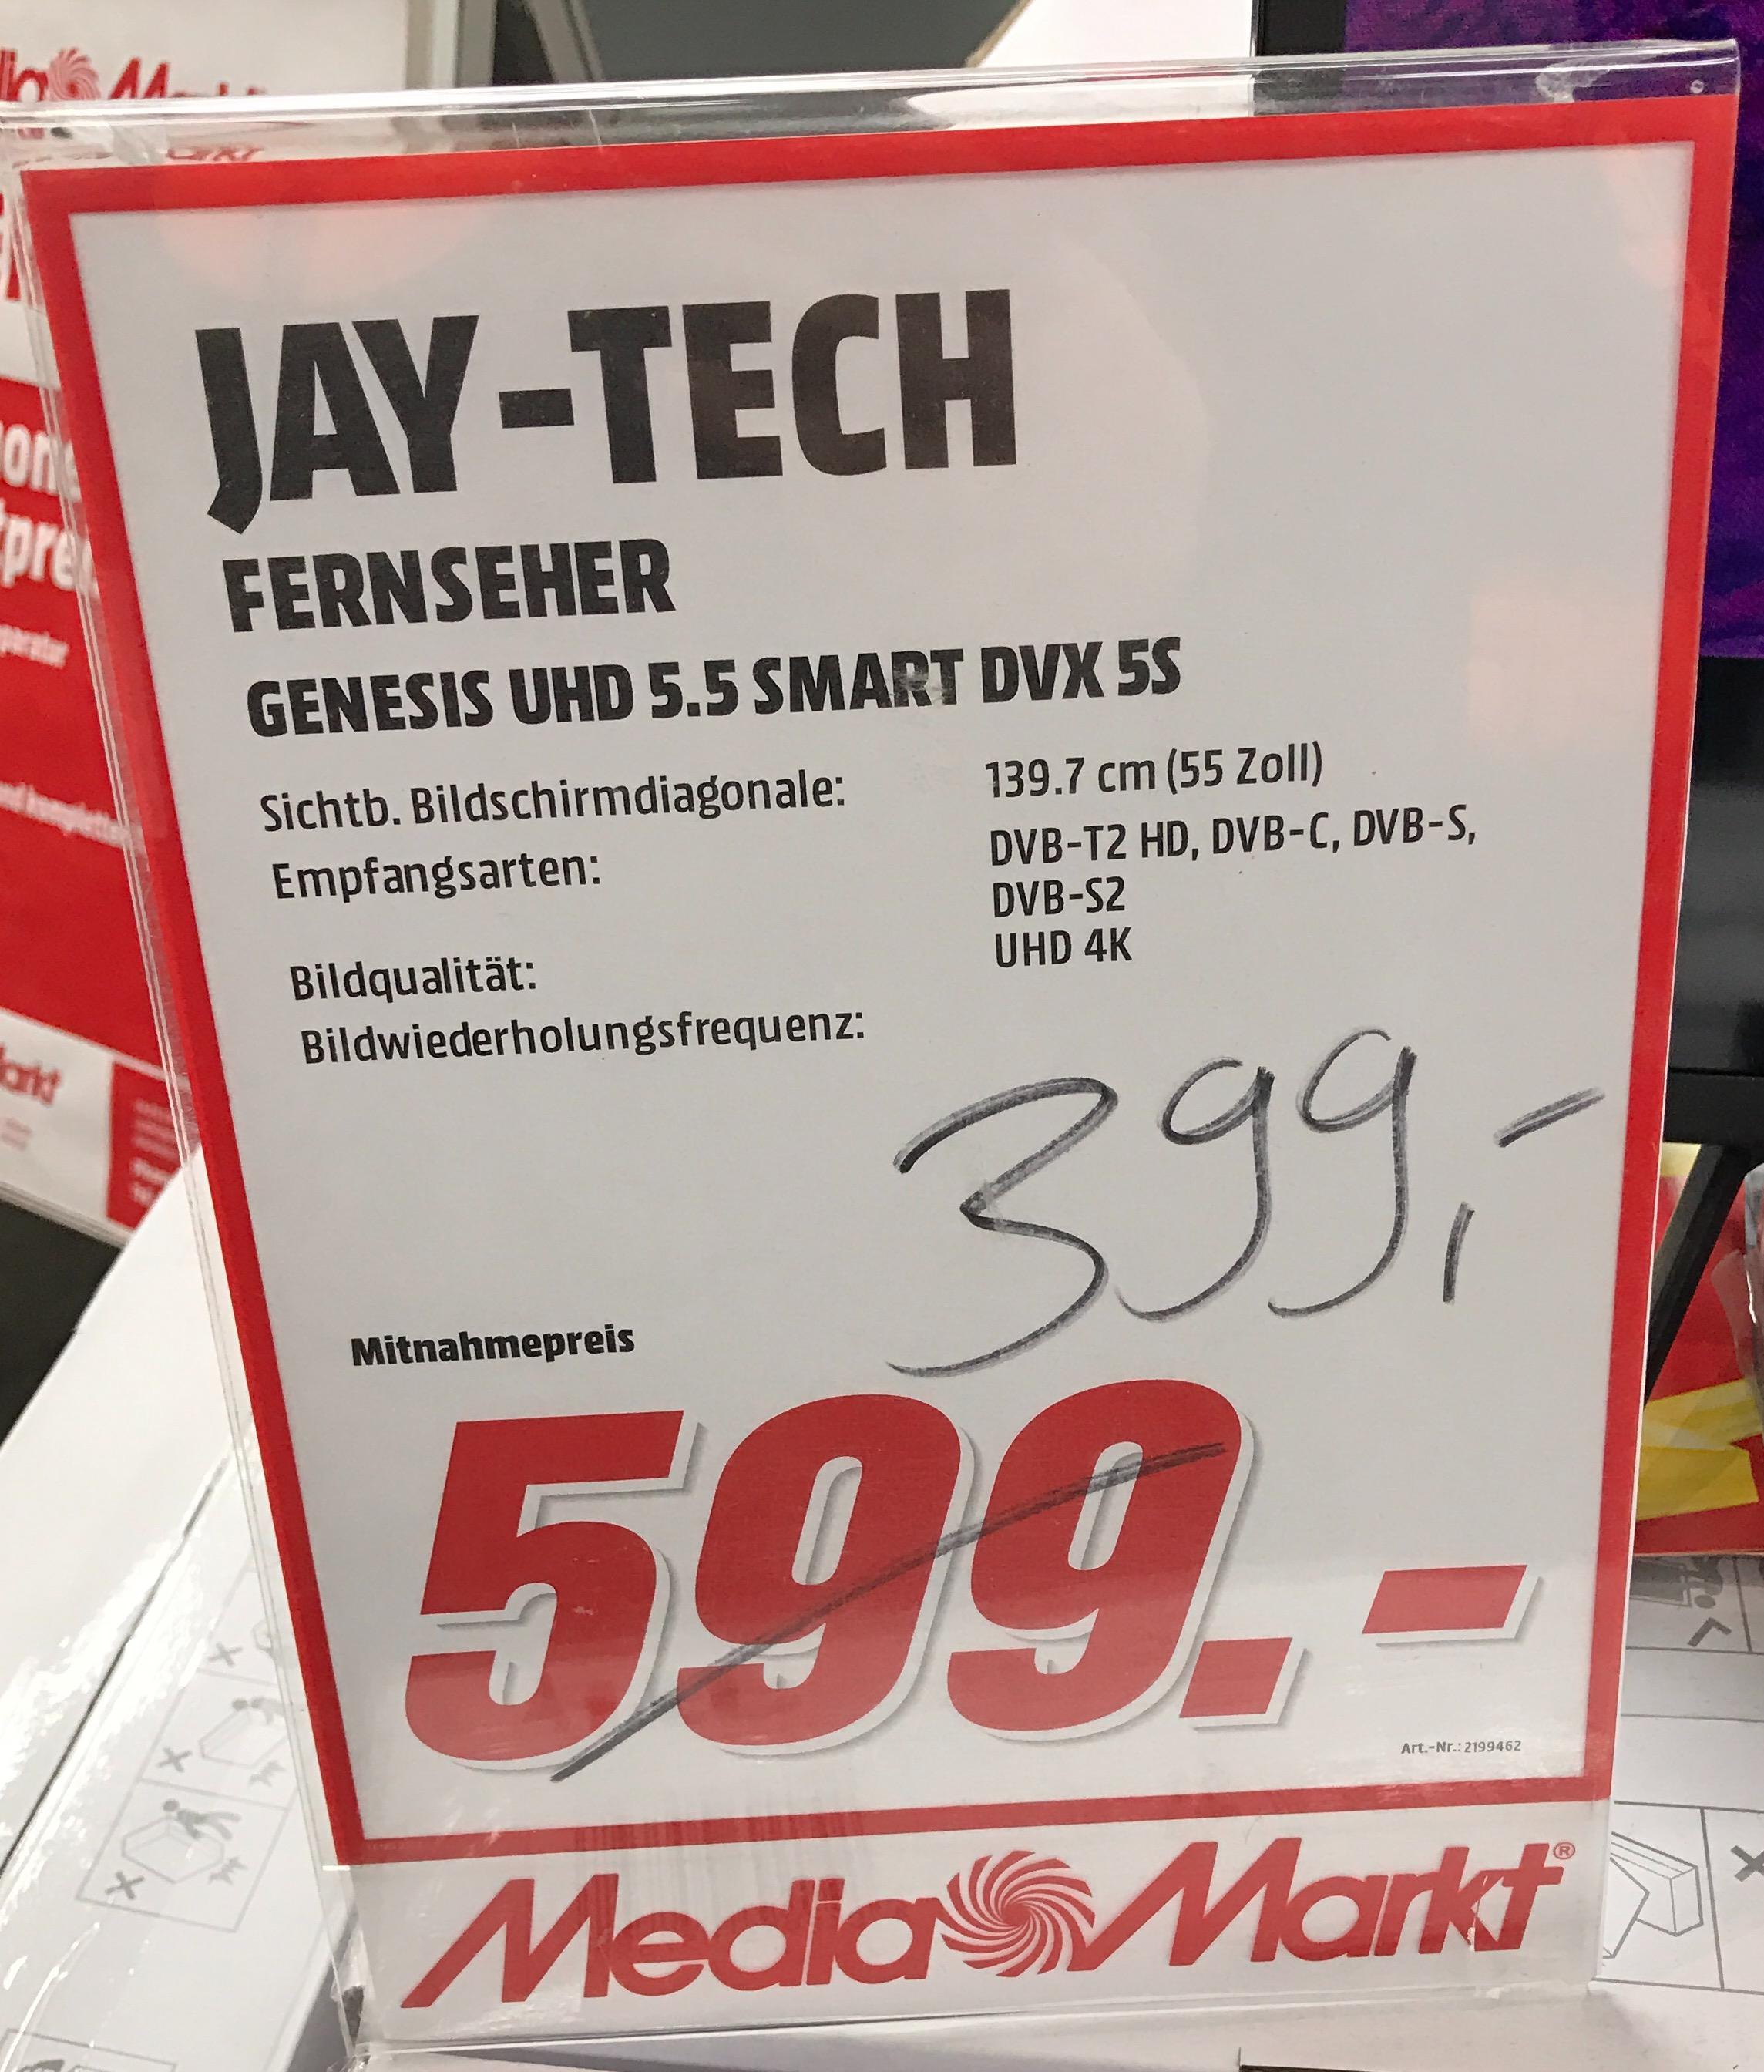 Lokal Media Markt Ludwigsburg Jay-tech GENESIS UHD 5.5